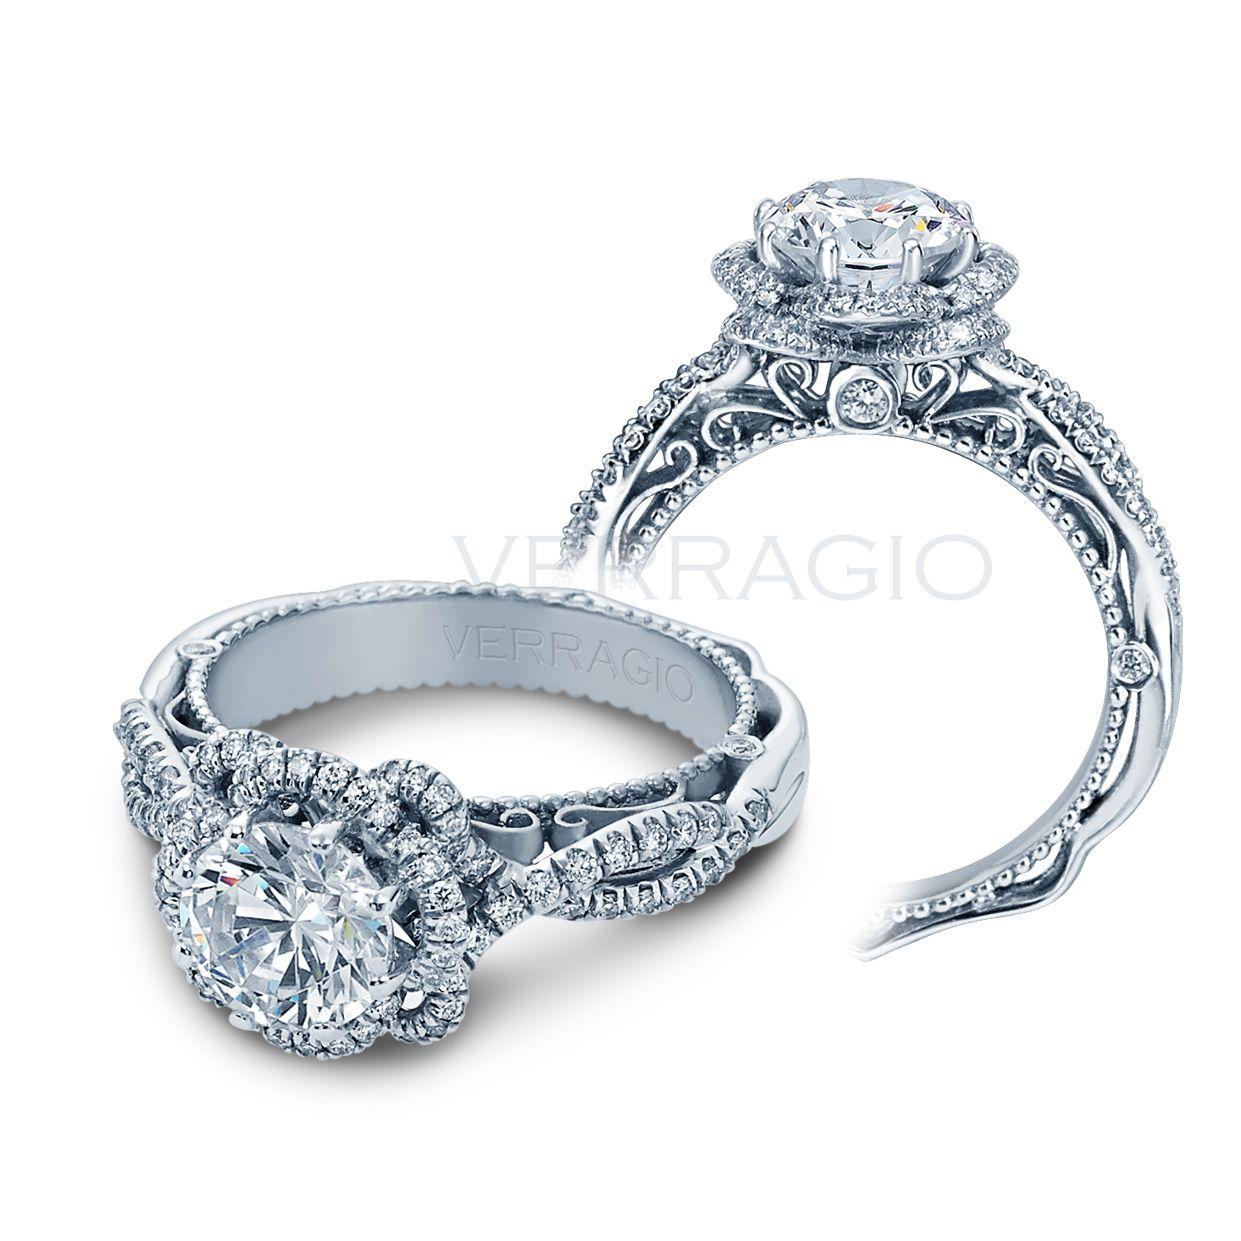 Verragio engagement rings afnrgl white gold ctw ring